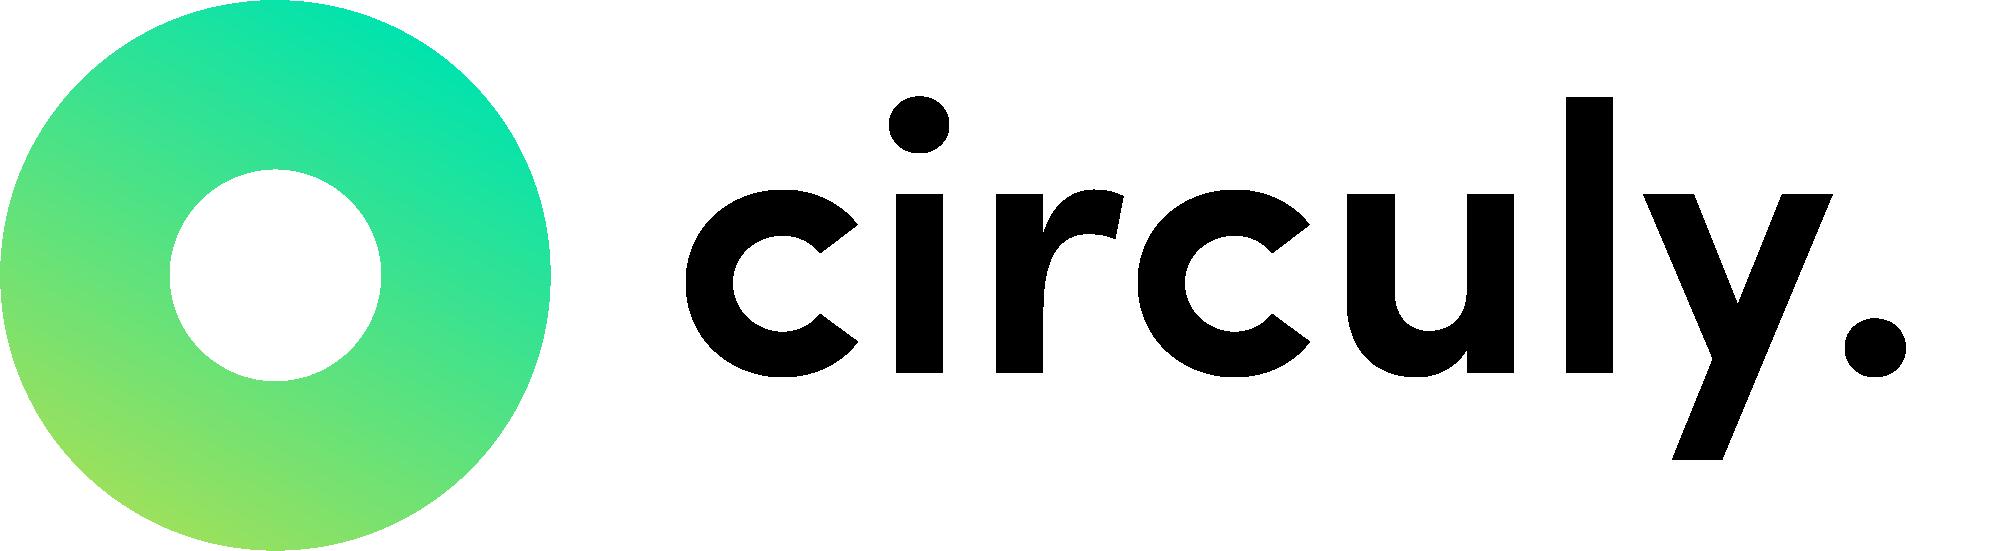 circuly logo